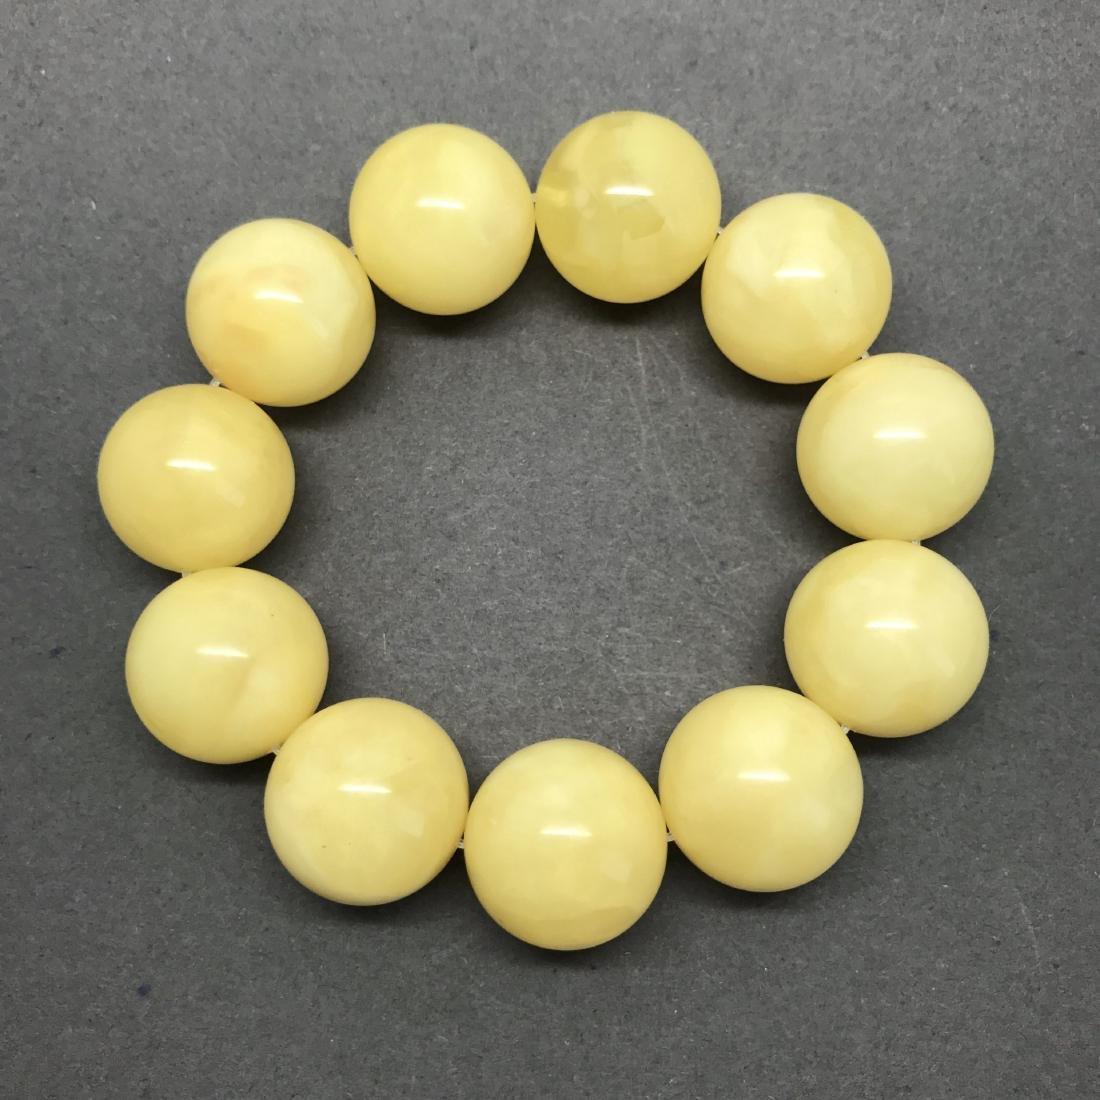 Baltic Amber Bracelet Yellow Butter Colour Big Beads - 6